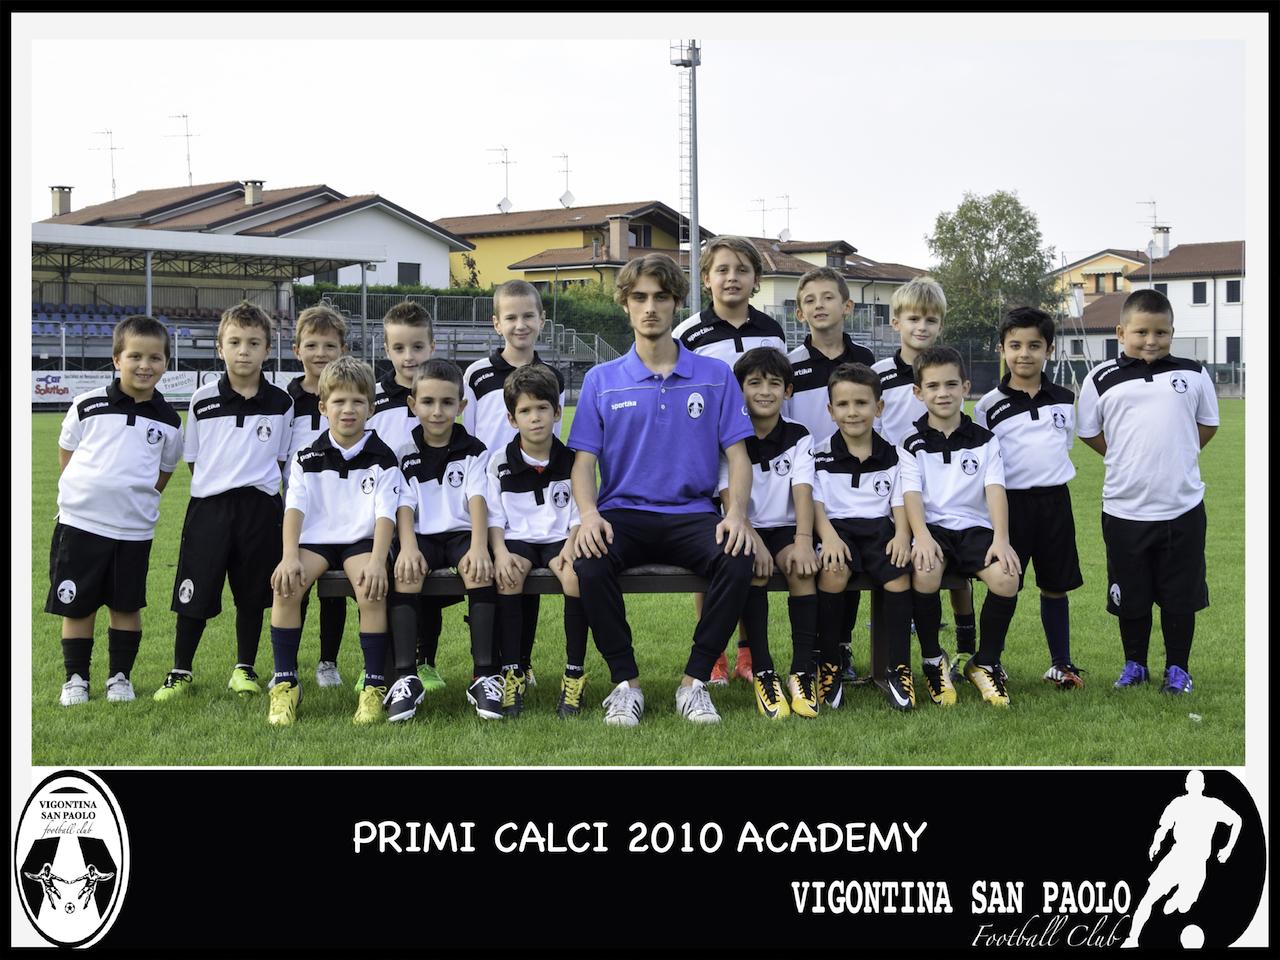 2010 Primi Calci Academy